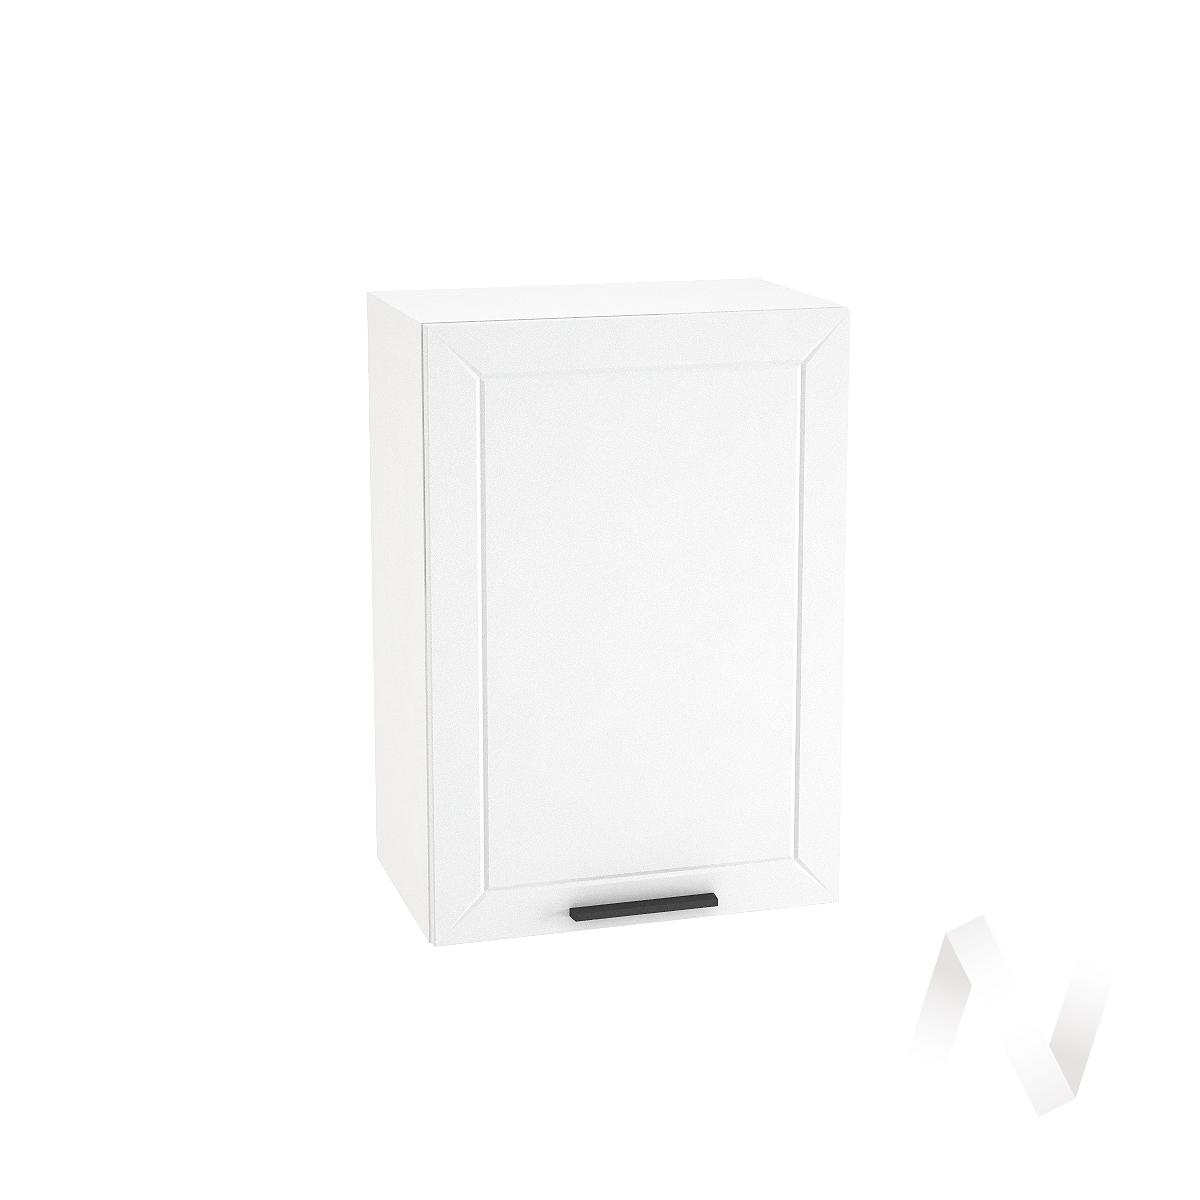 "Кухня ""Глетчер"": Шкаф верхний 500, ШВ 500 (Айленд Силк/корпус белый)"